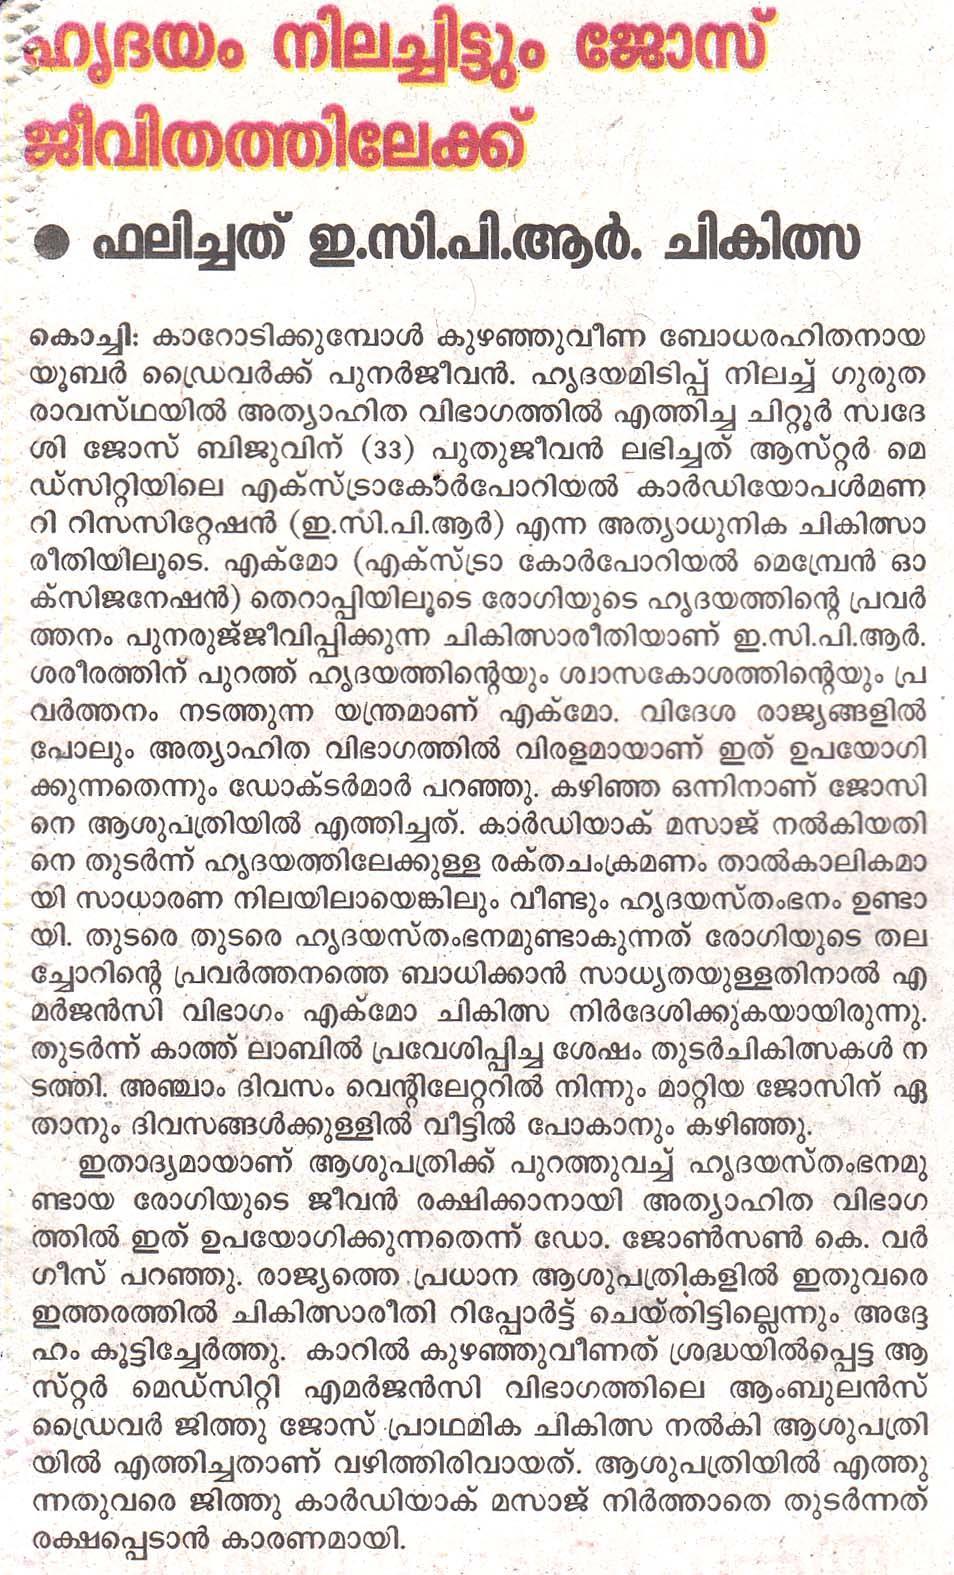 23 11 2019 Mangalam Pg 12